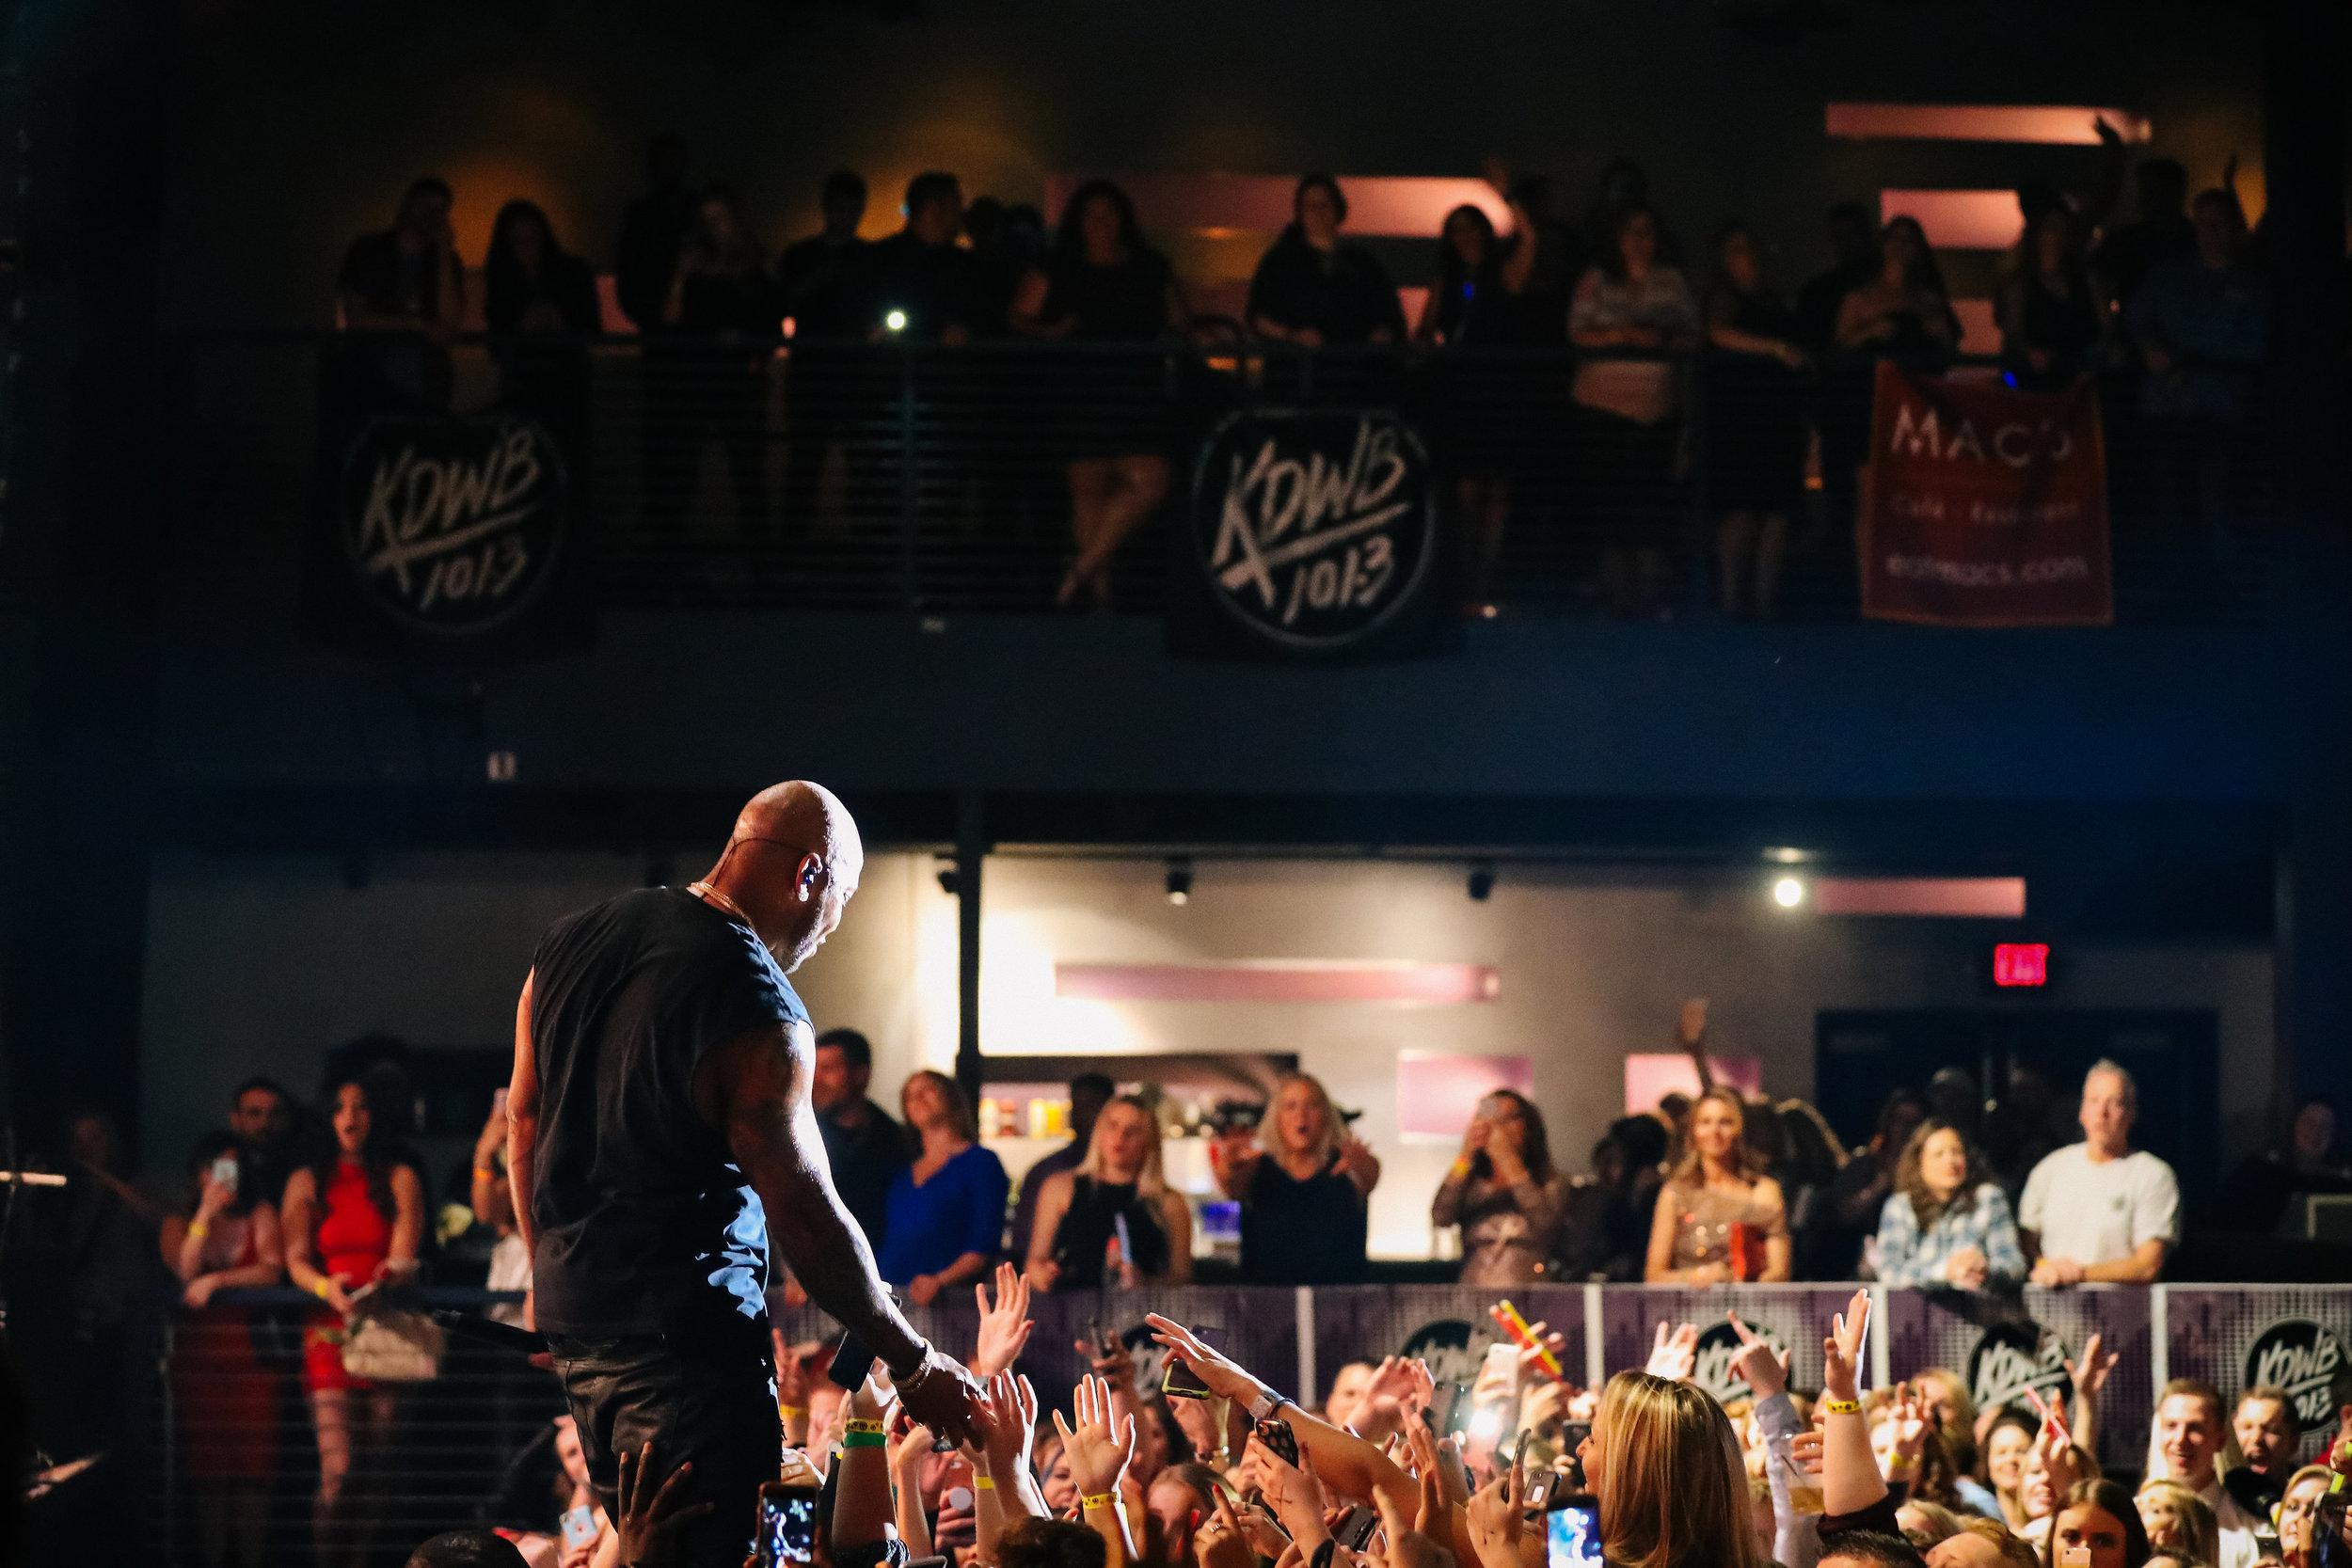 Flo Rida Minnesota Concert 2017 Photographer